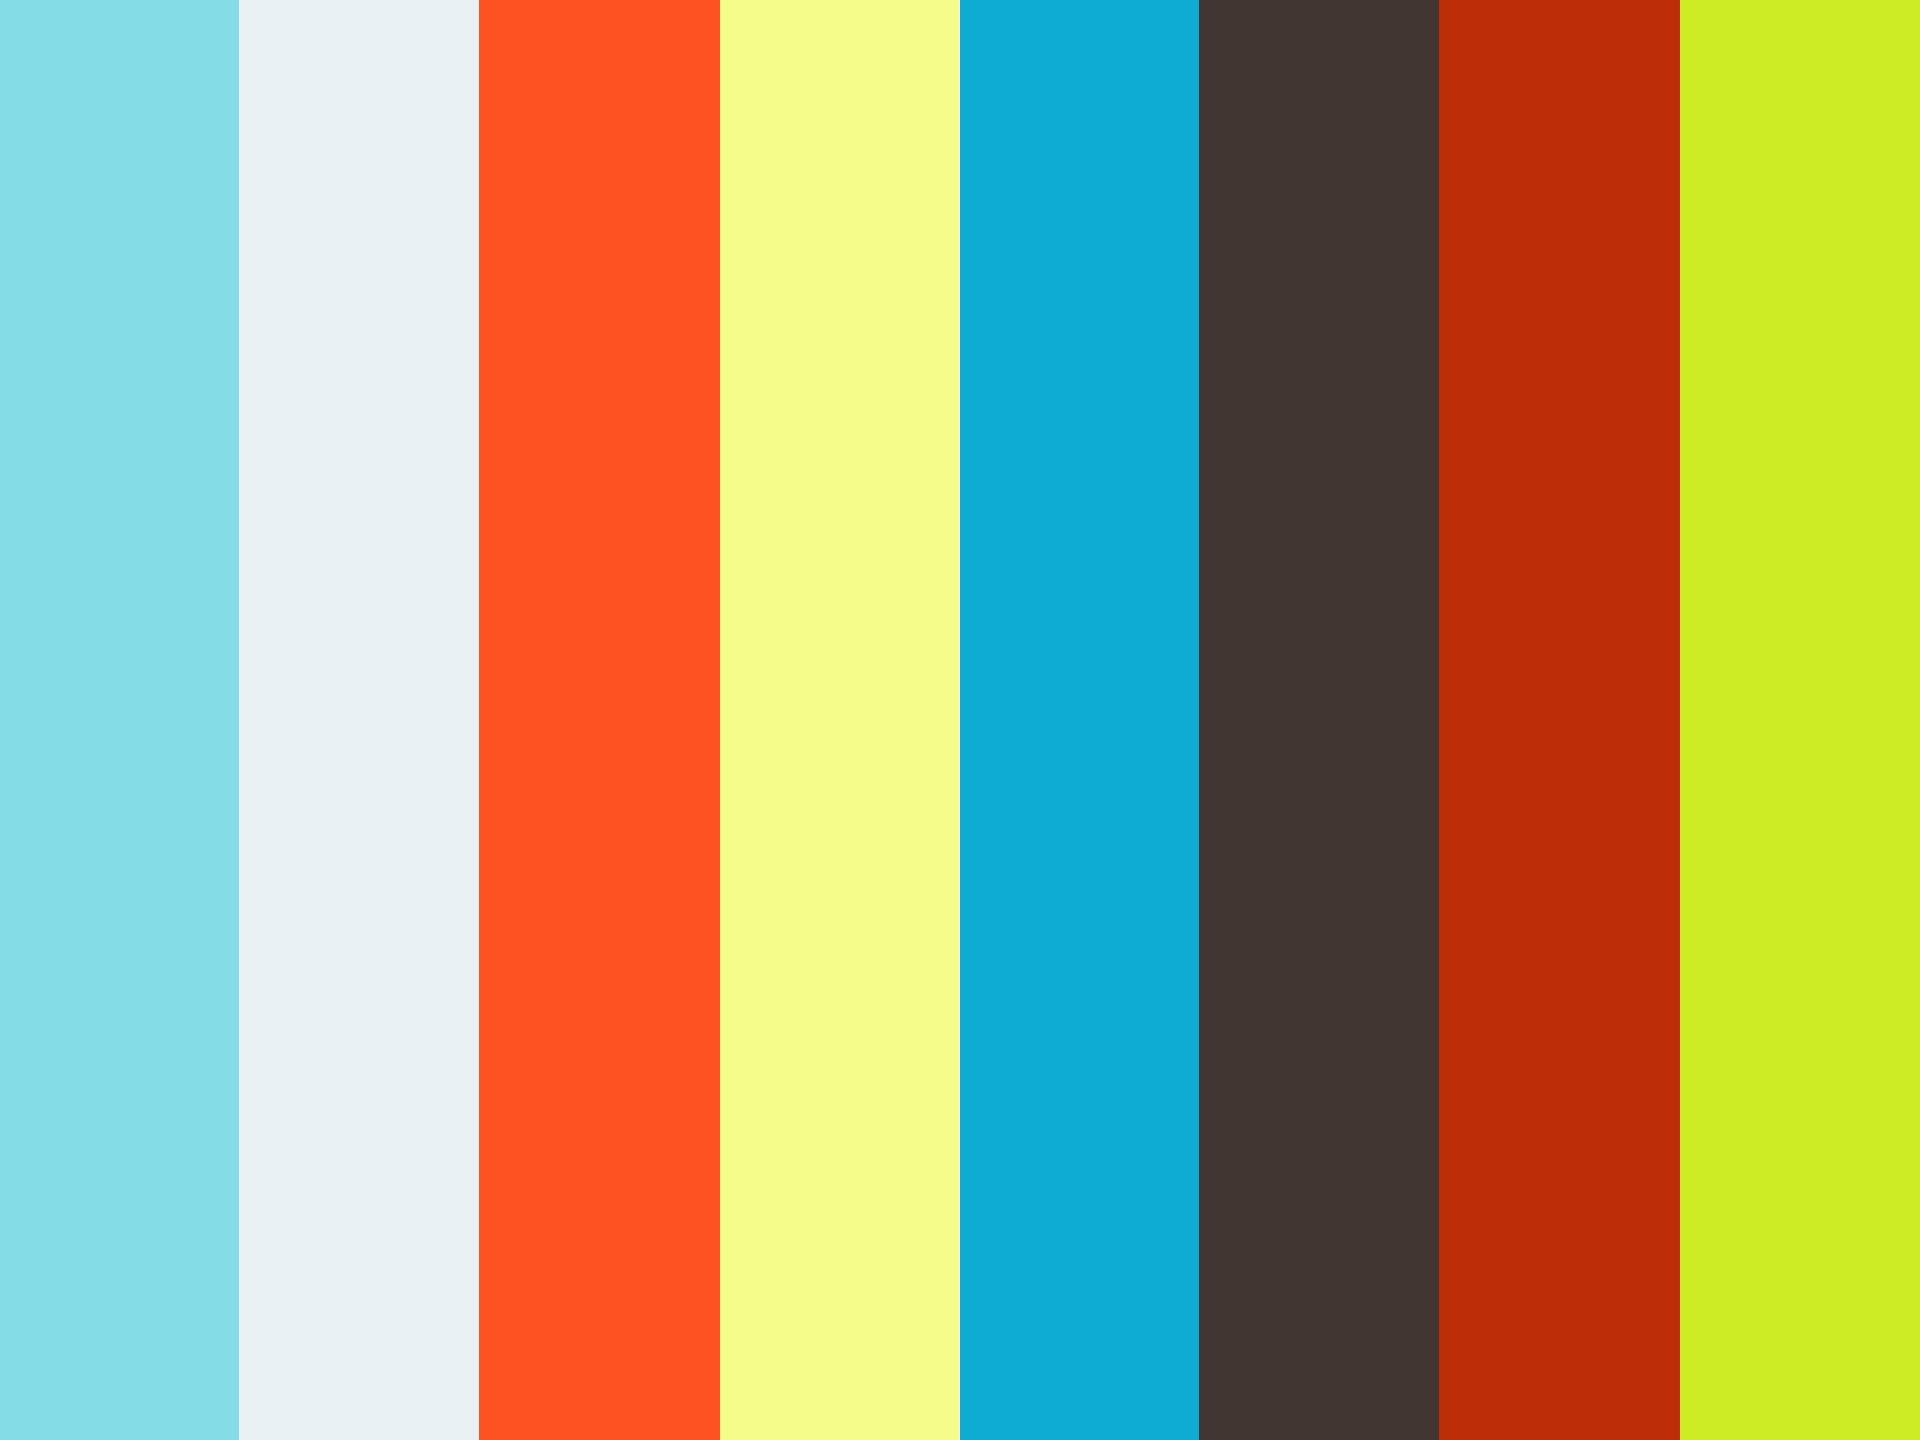 sc 1 st  Vimeo & Mixed Lighting - Continuous u0026 Flash - AurumLight on Vimeo